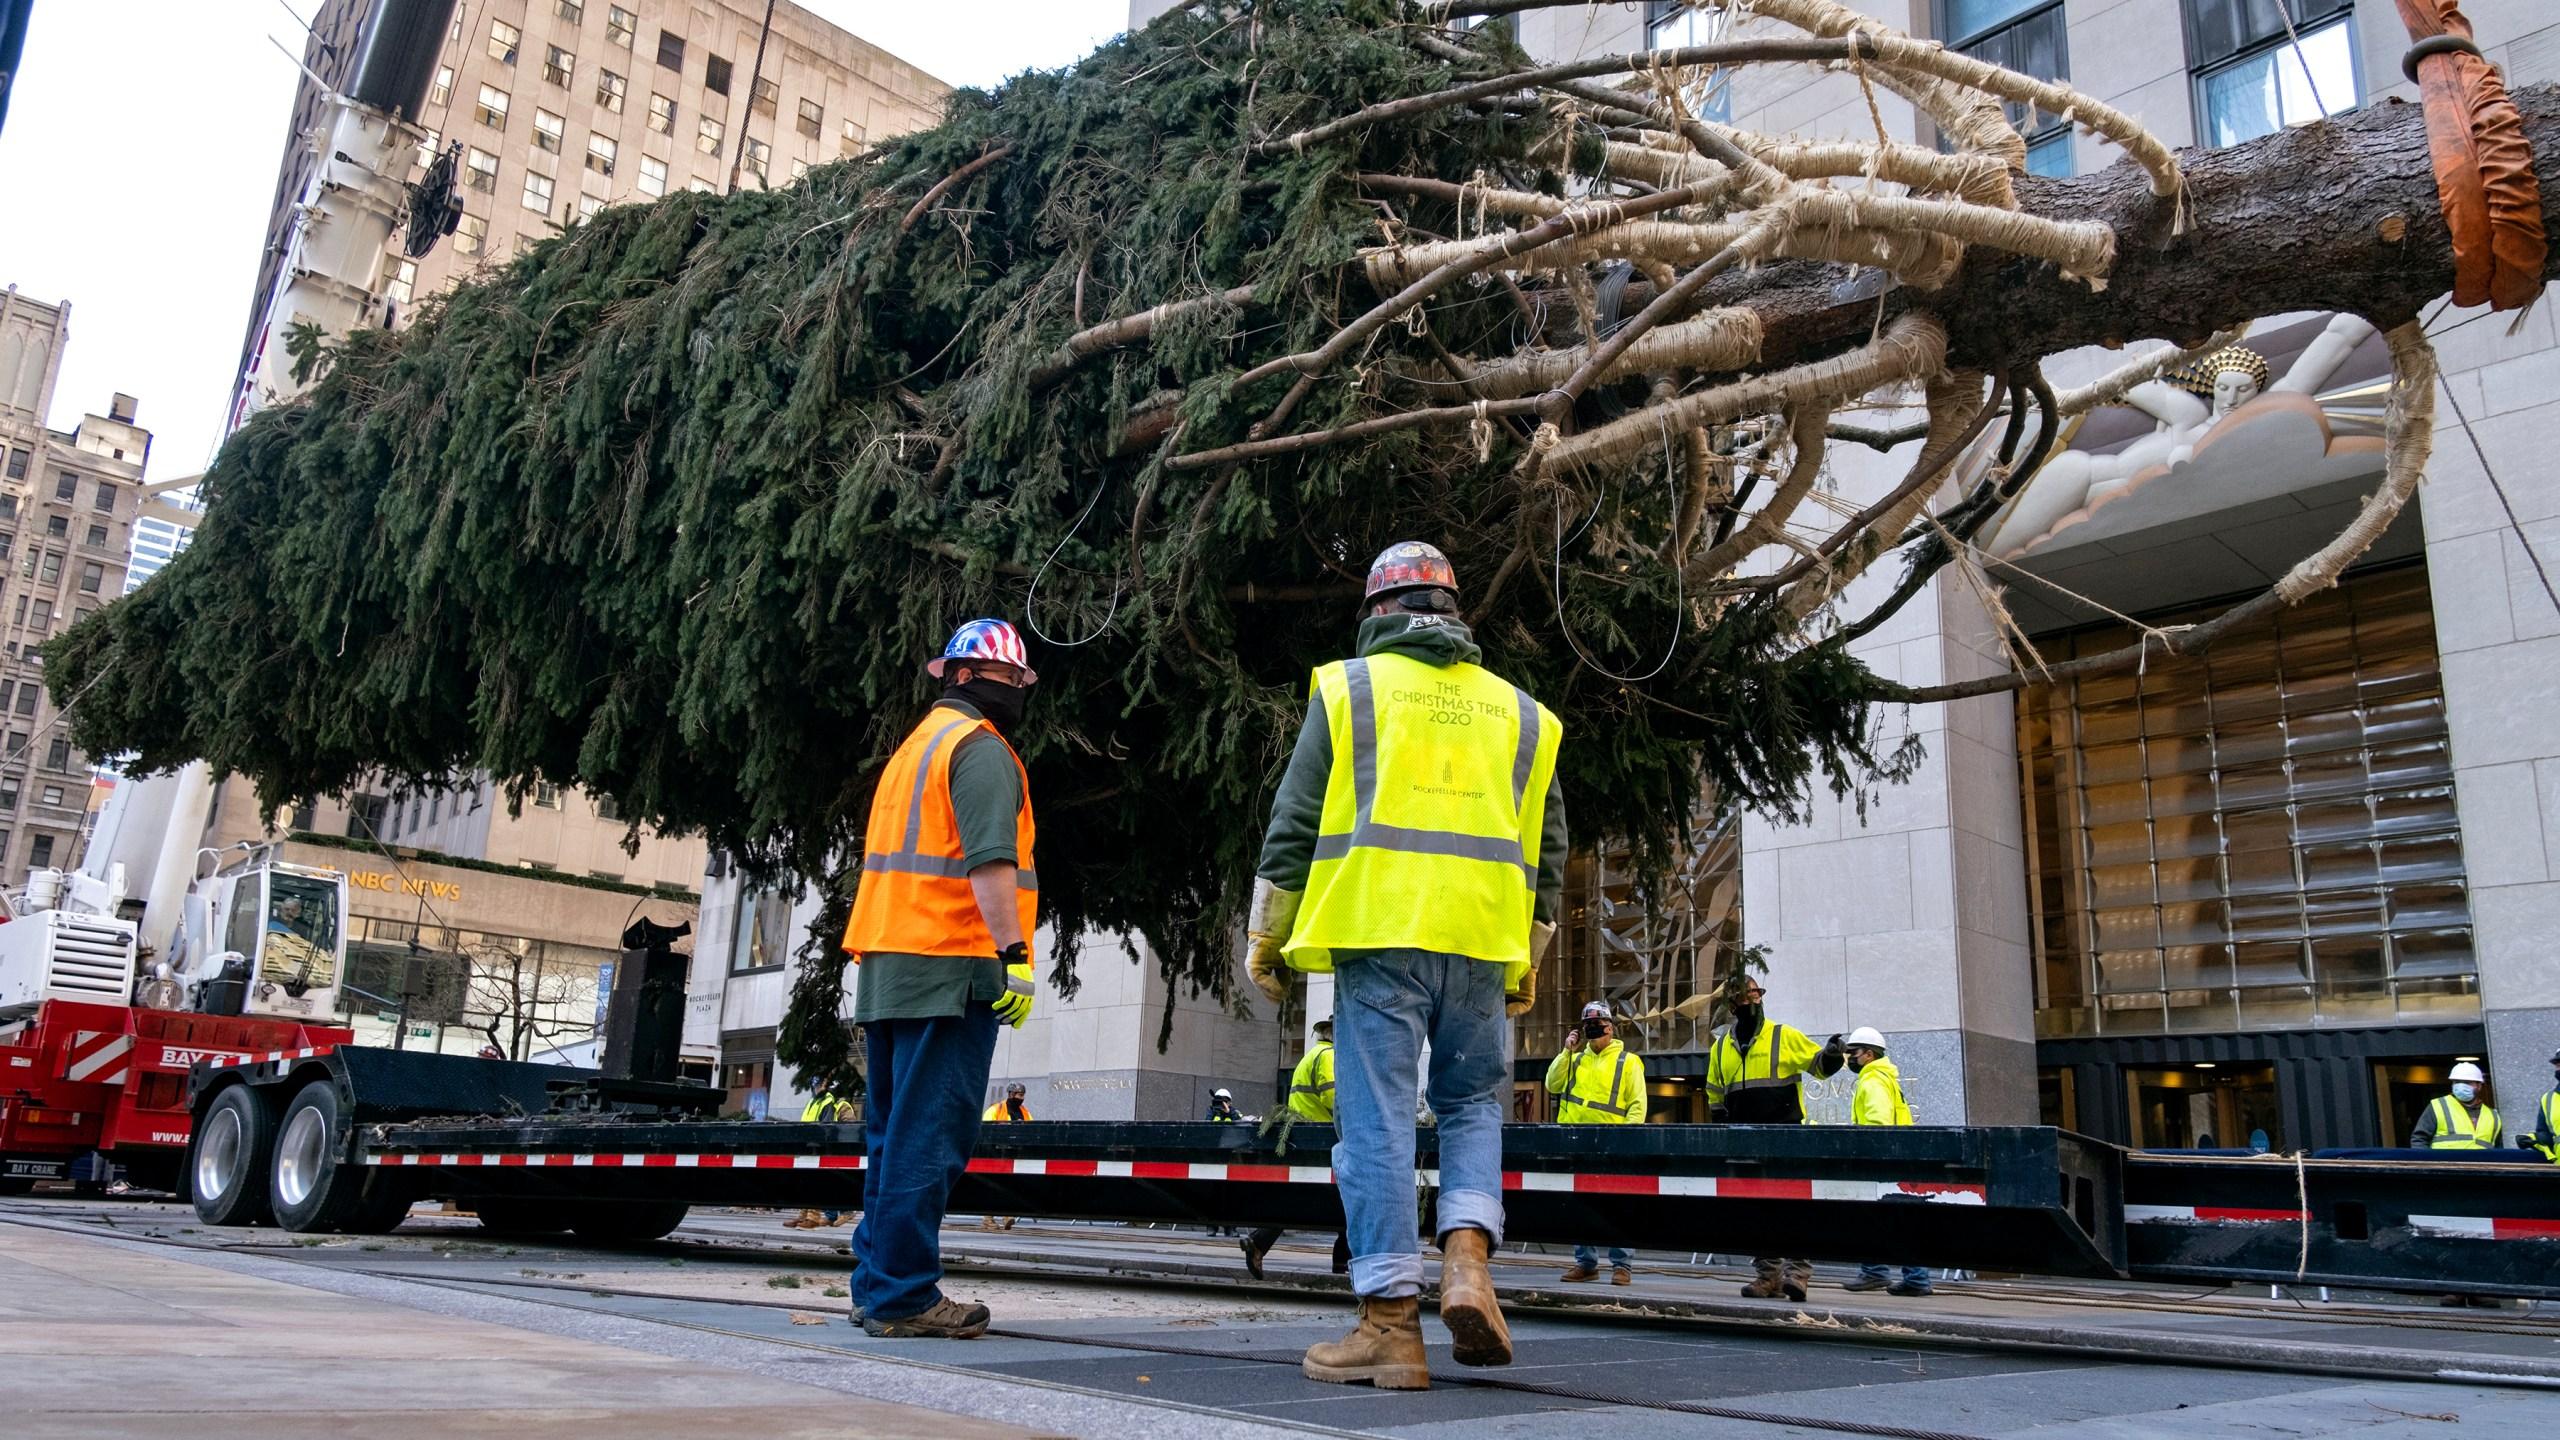 Christmas Assistance Dates For Green Bay Wisconsin 2020 Rockefeller Center Christmas tree arrives; lighting Dec. 2 | WFRV